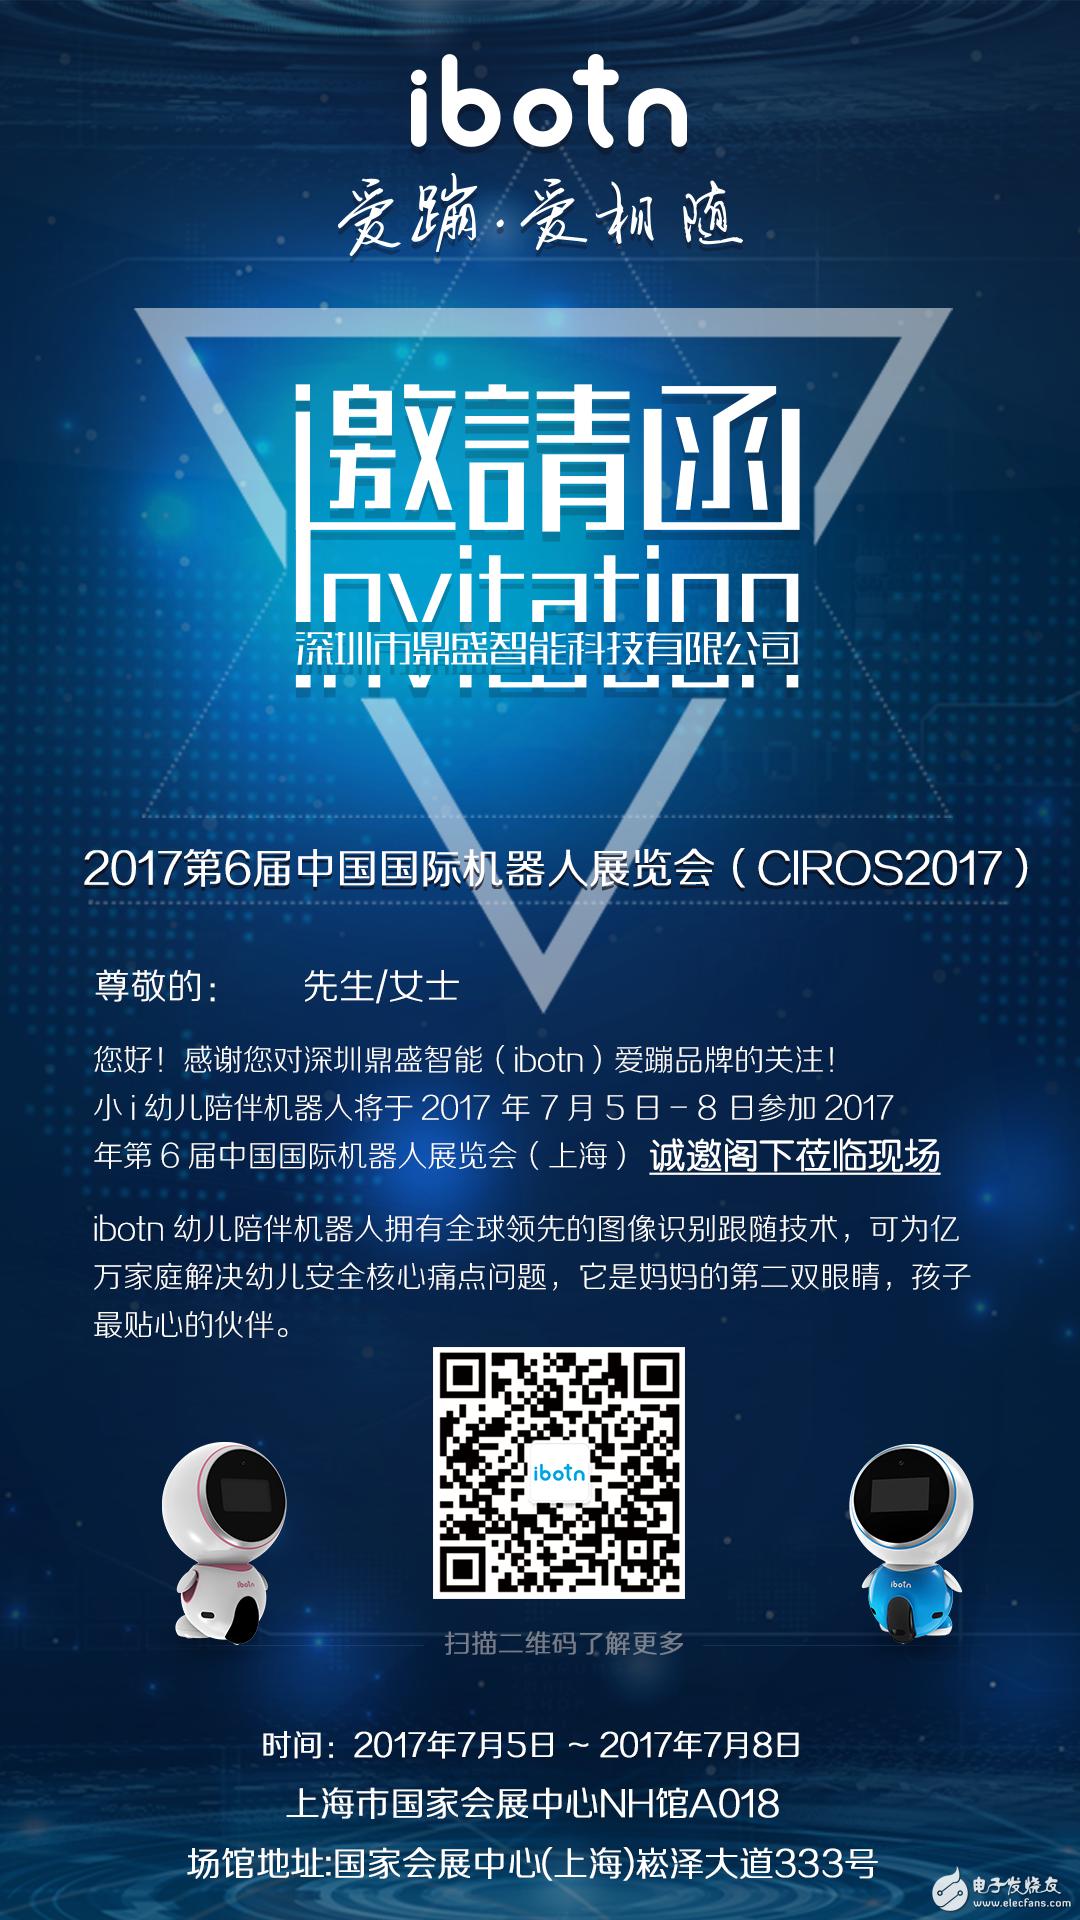 ibotn邀您参展CIROS2017第六届中国国际机器人展览会 (上海)